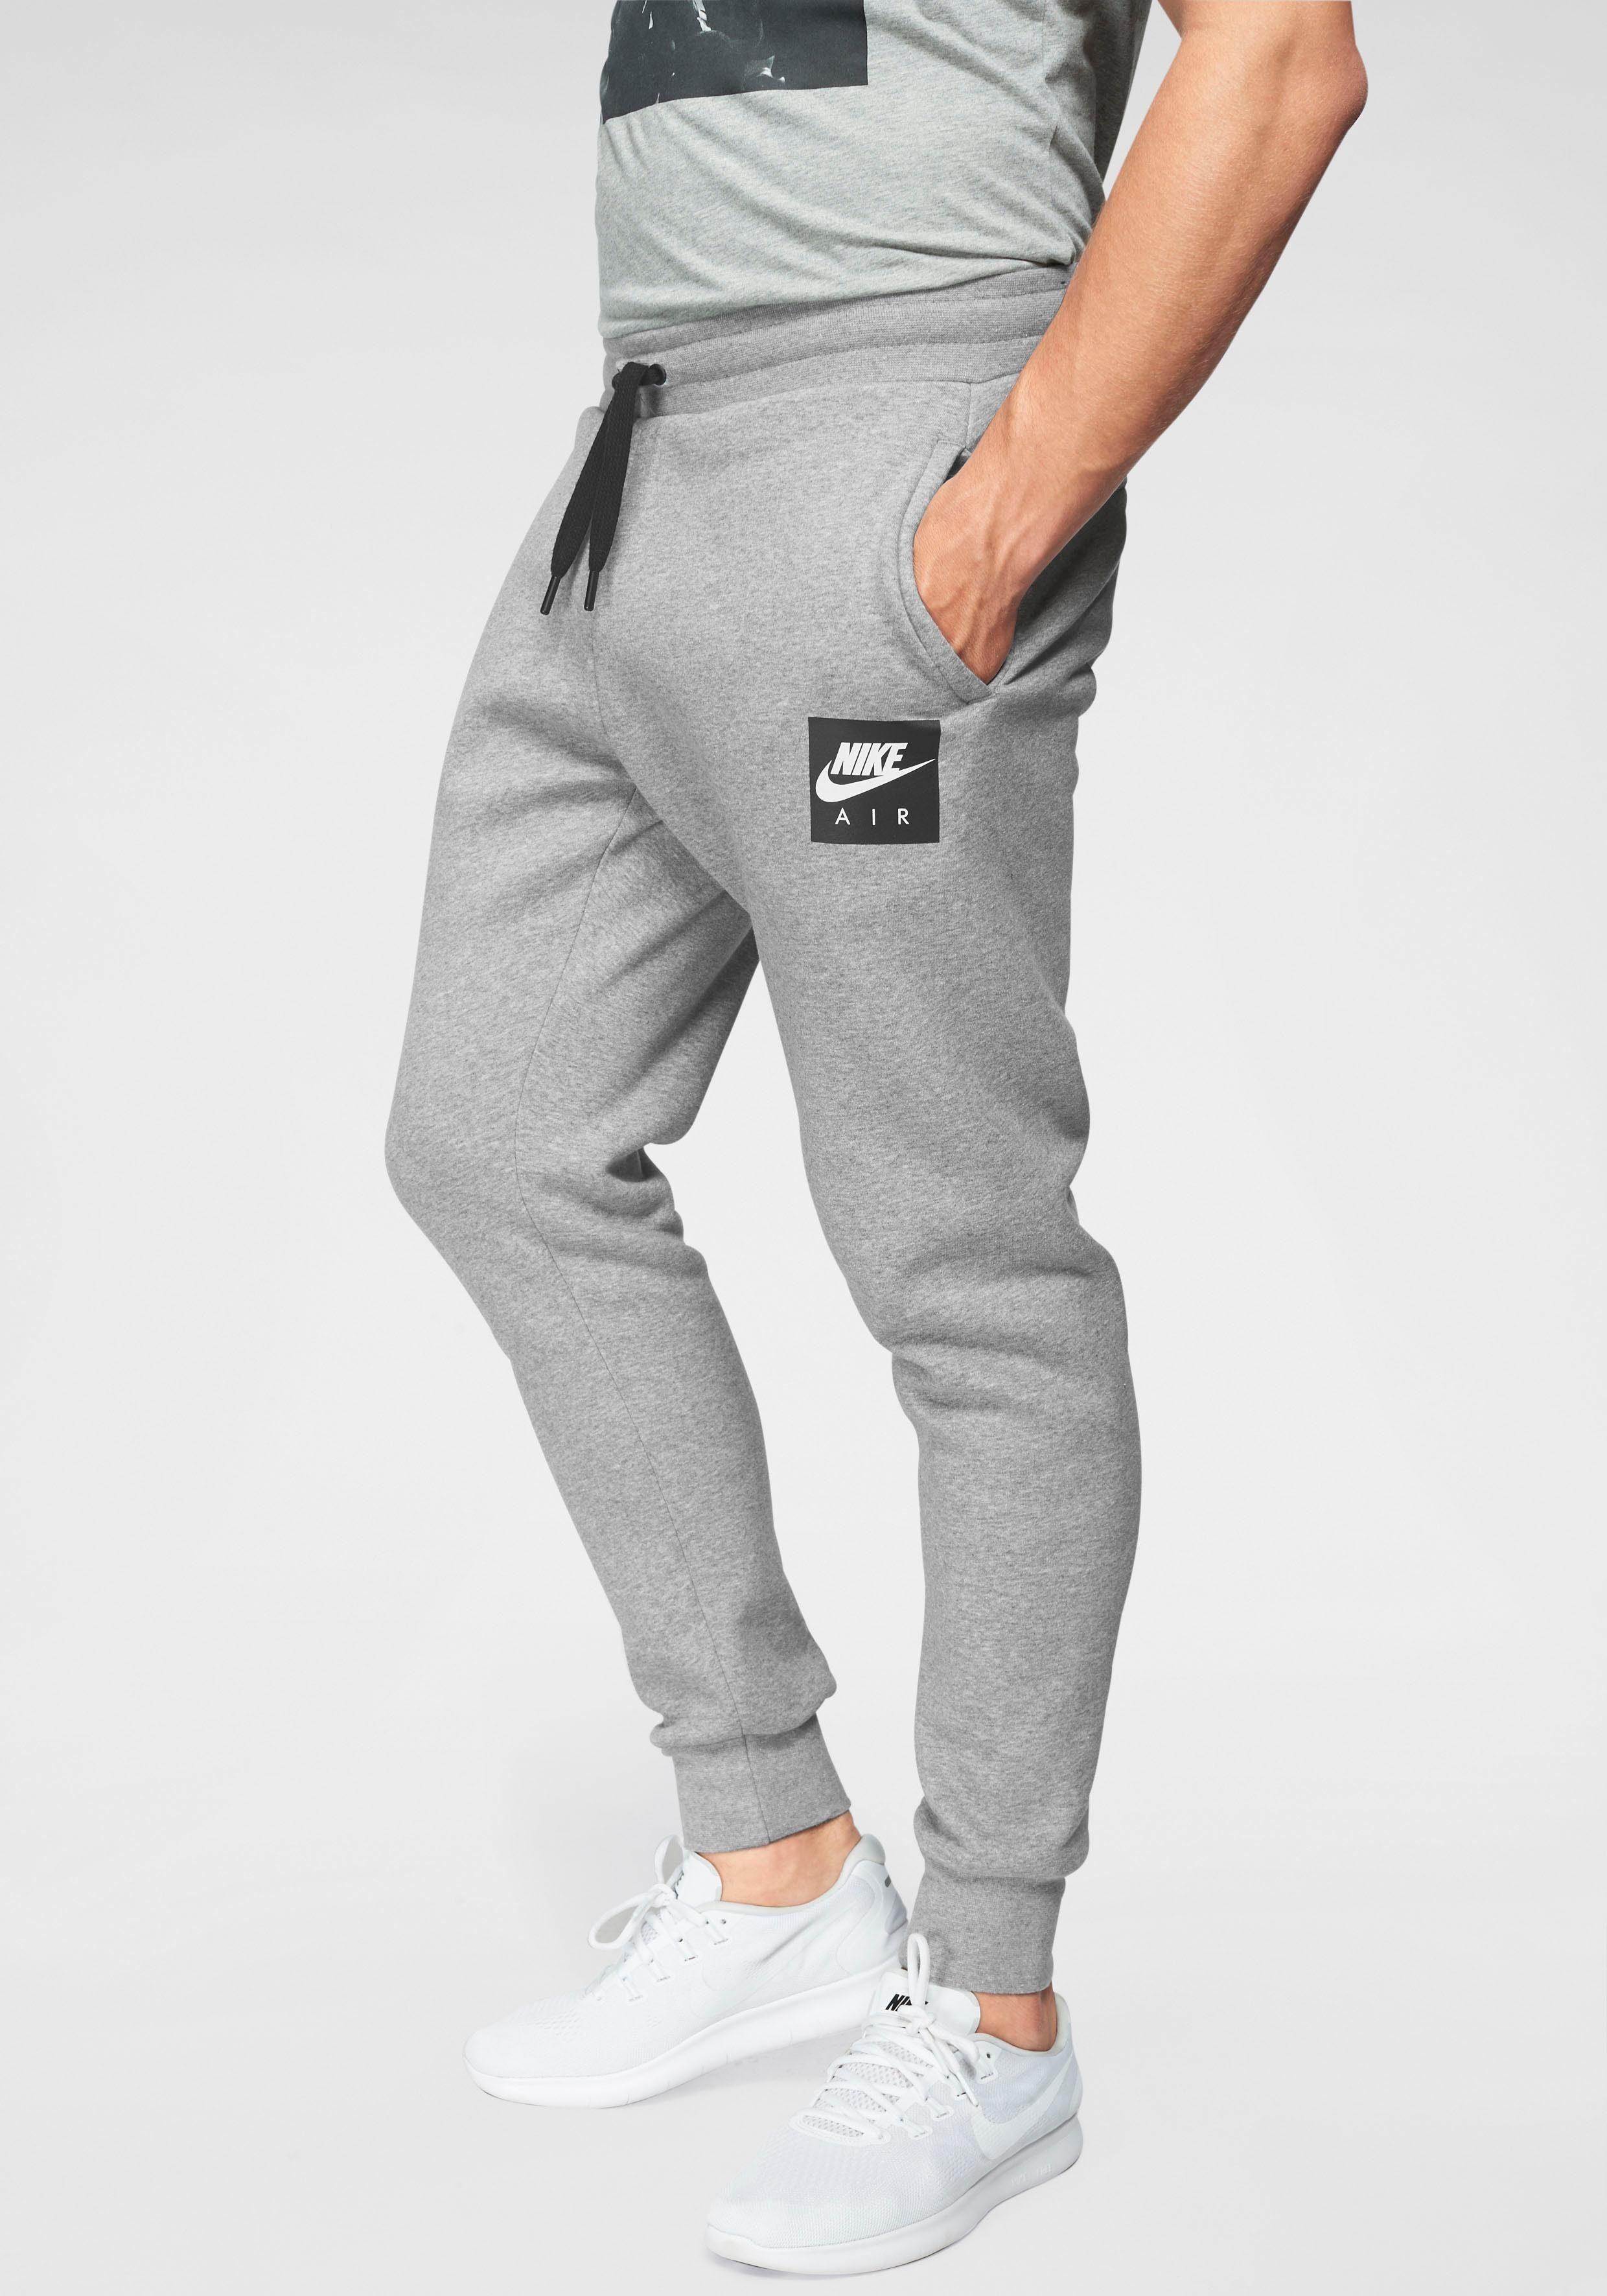 Nike Sportswear Jogginghose »M NSW NIKE AIR PANT FLC«, Großer Logodruck am Bein online kaufen   OTTO